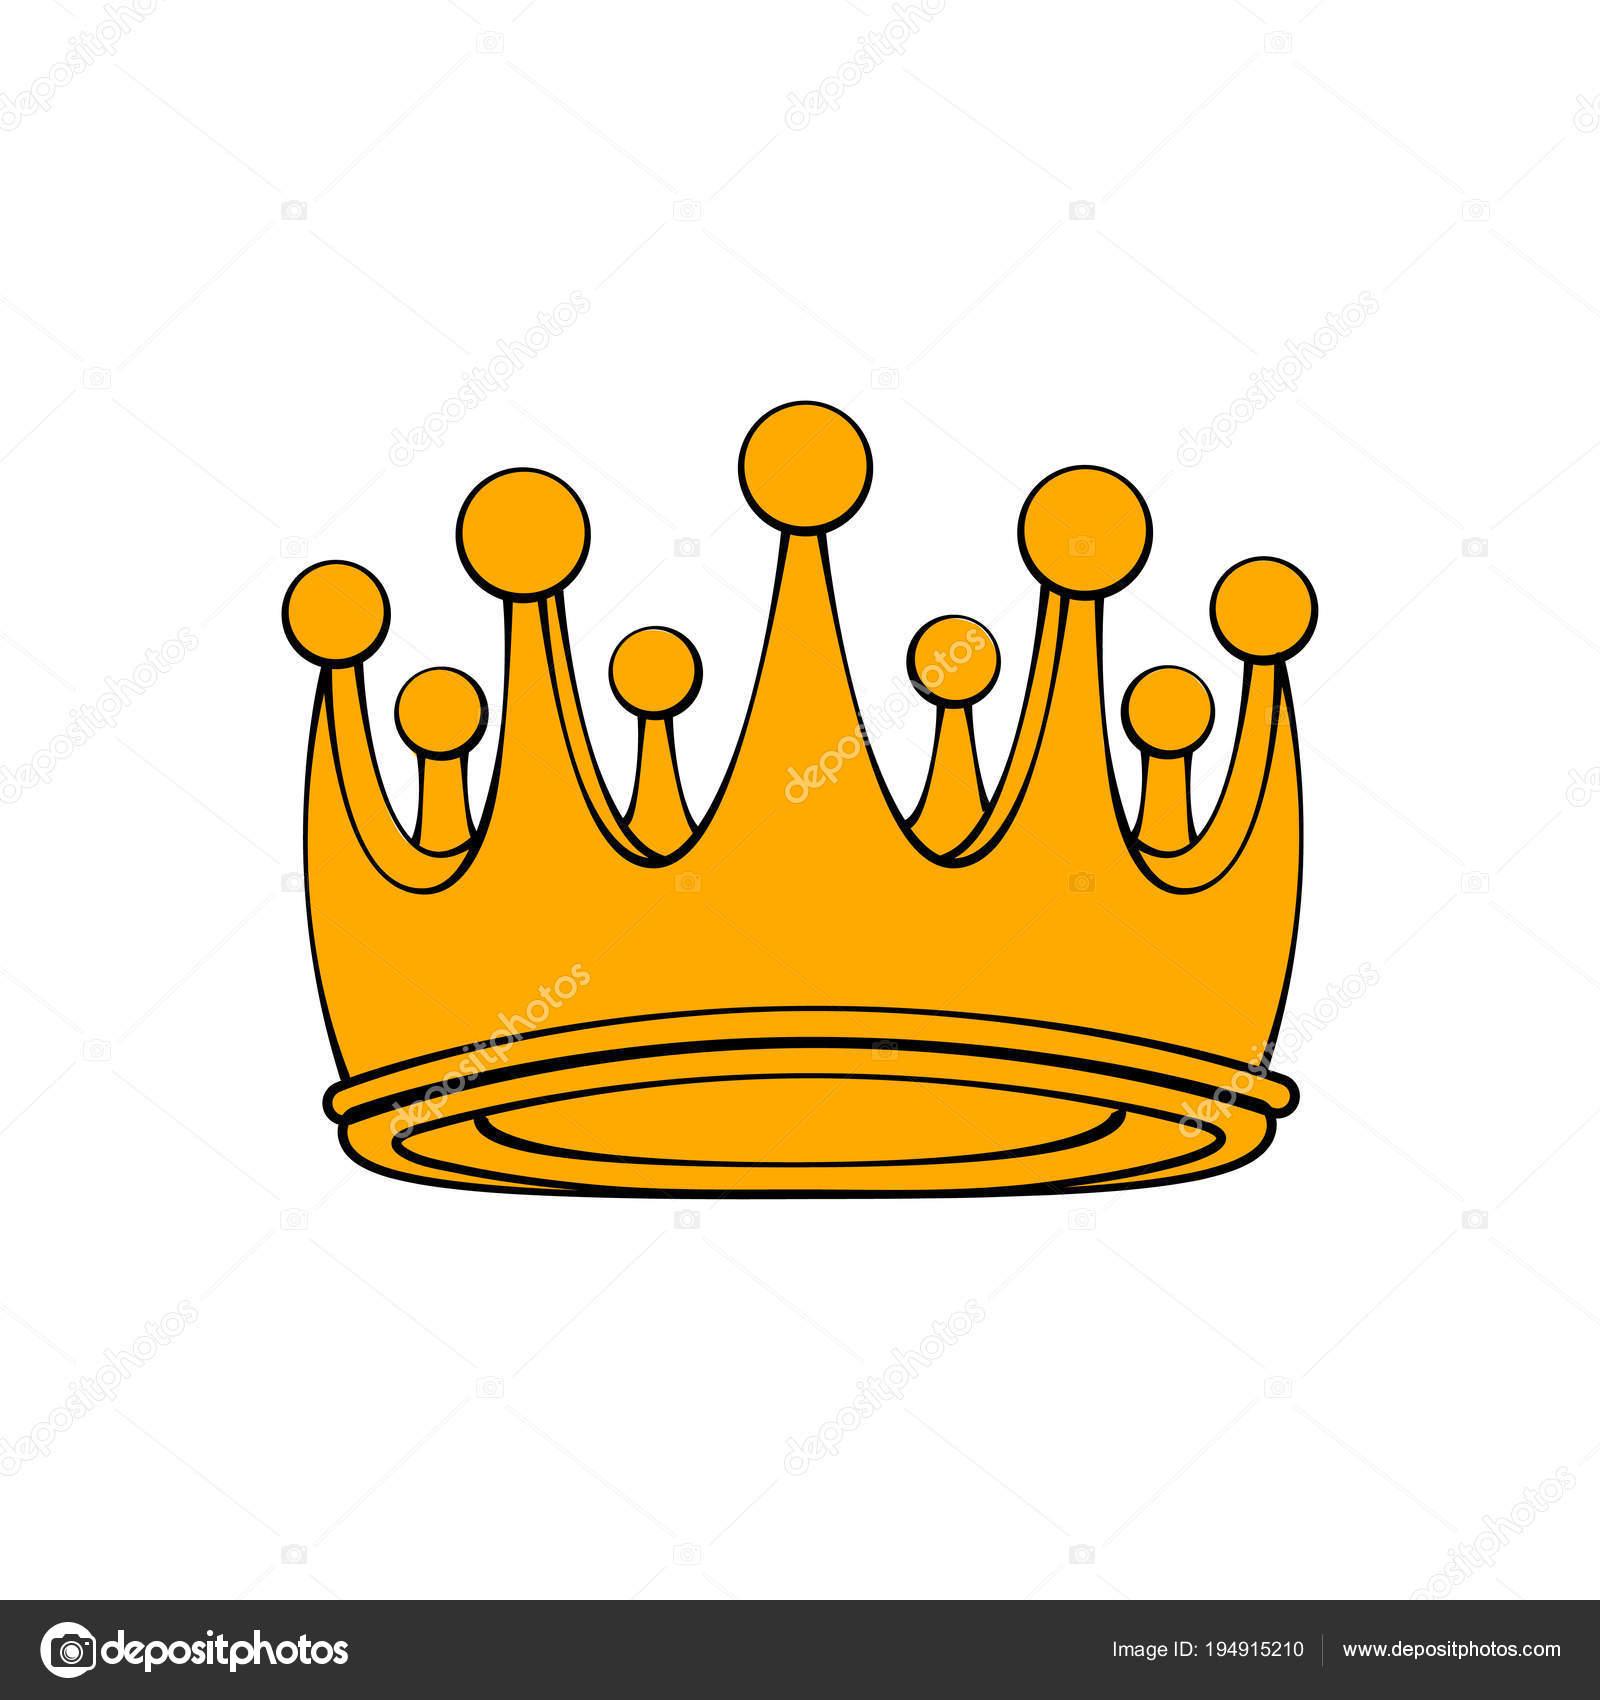 Royal Ceremonial Gold Crown Royal Symbol Decorative Design Element